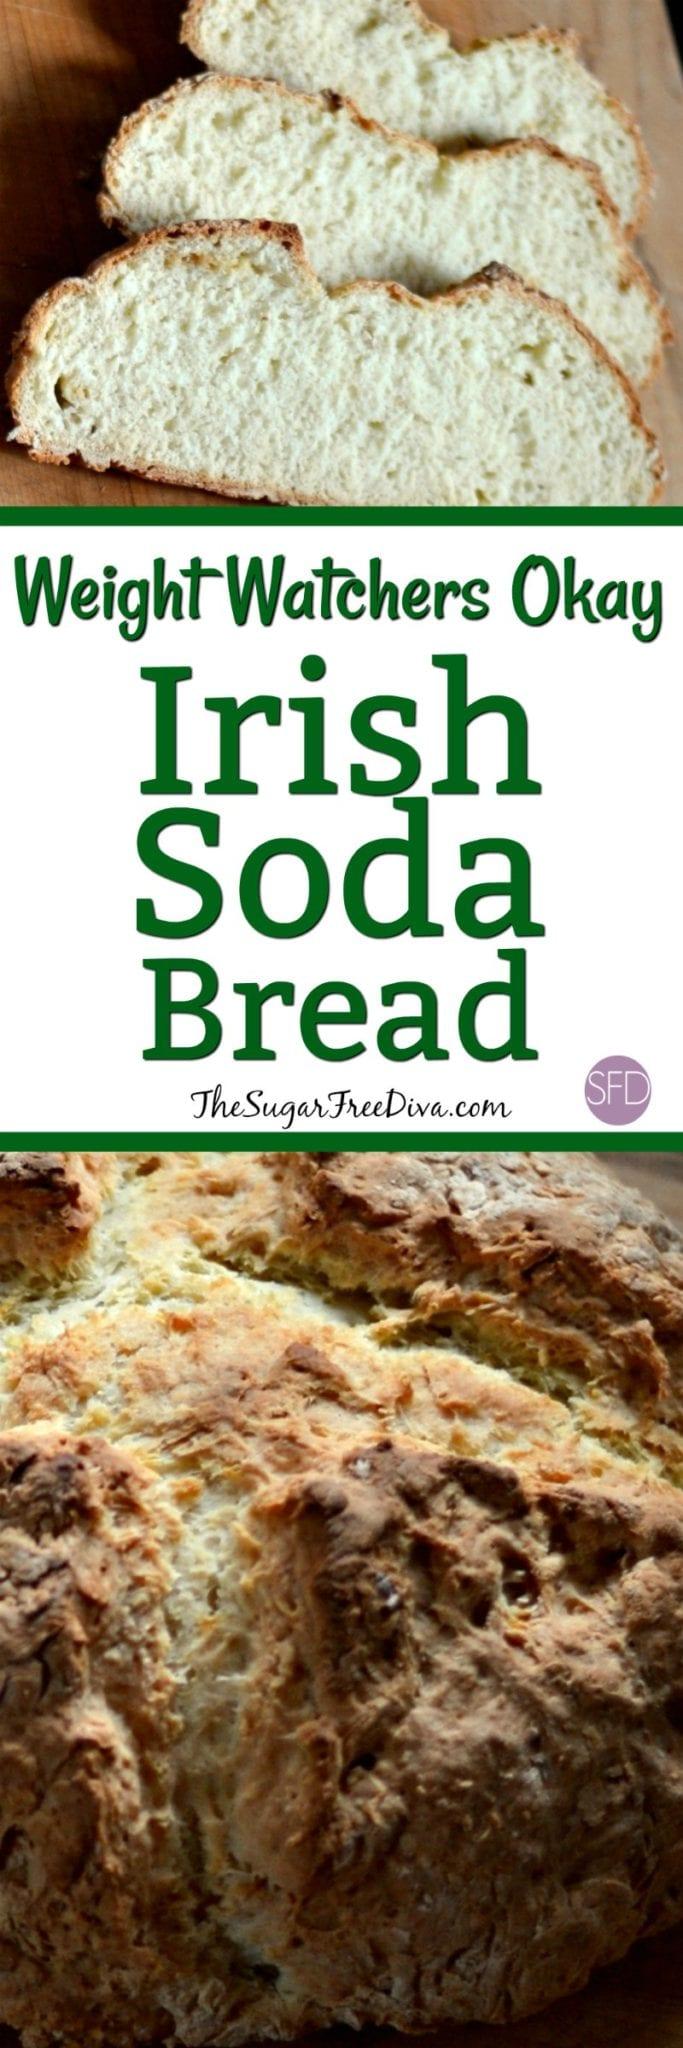 Weight Watchers Okay Irish Soda Bread